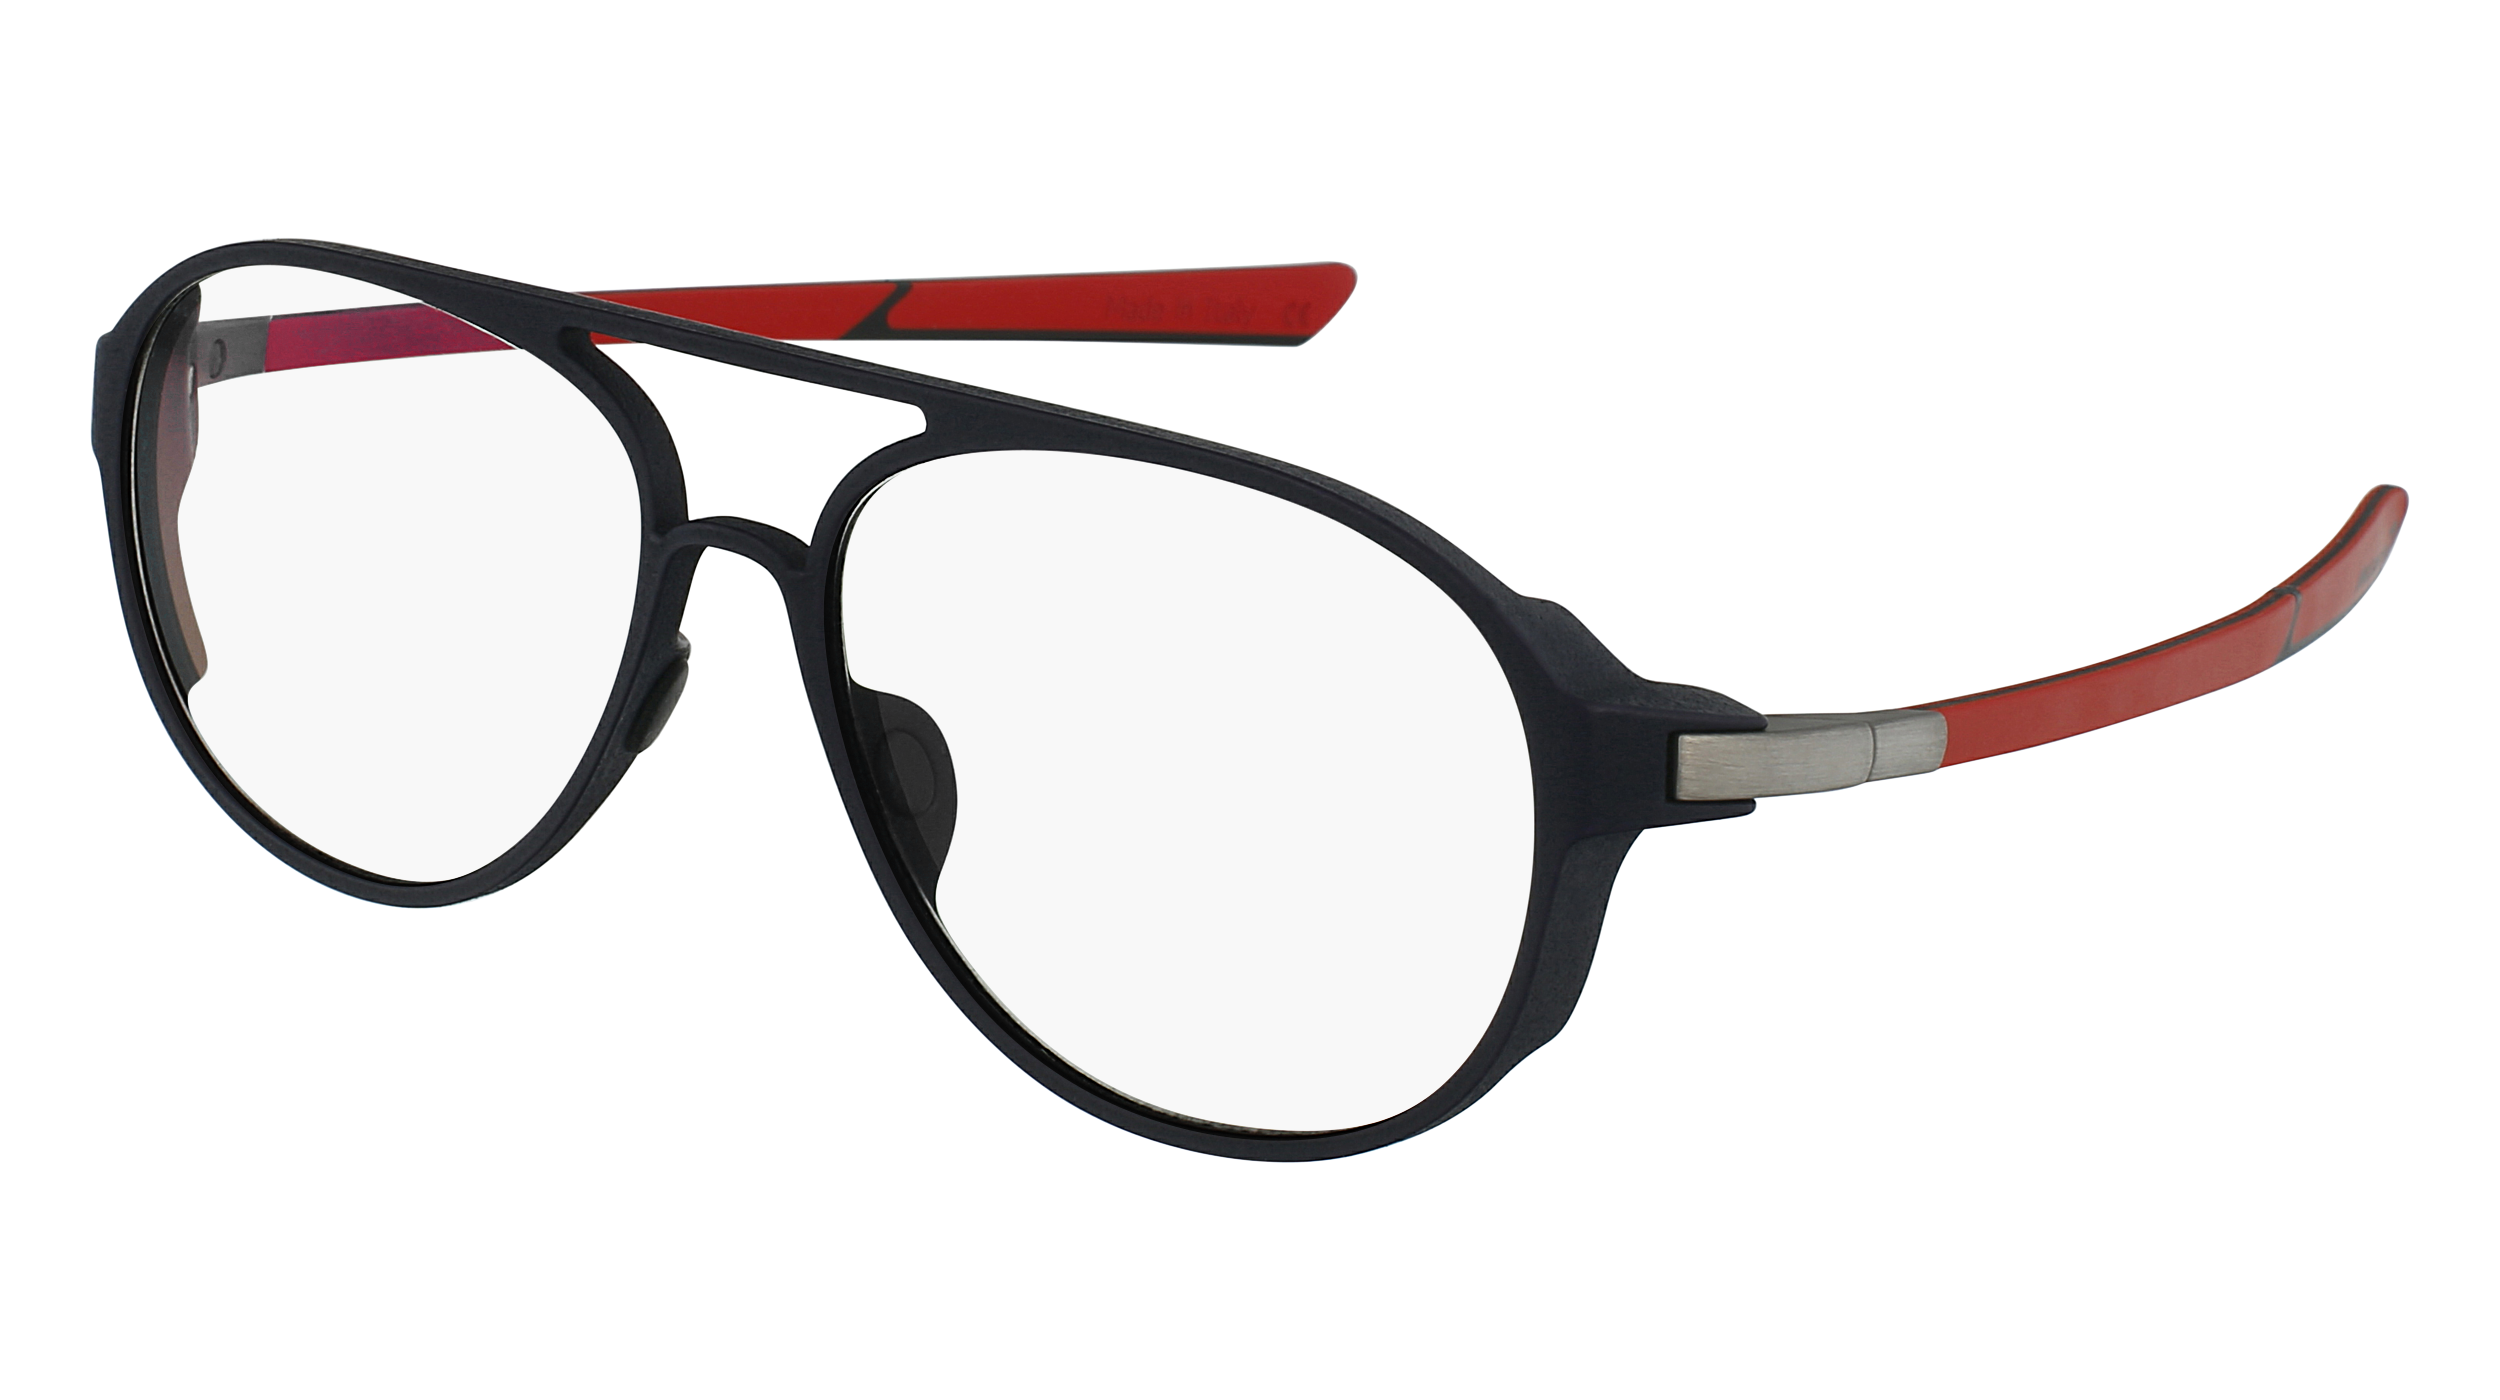 McLaren MLSGPO02.C02.55